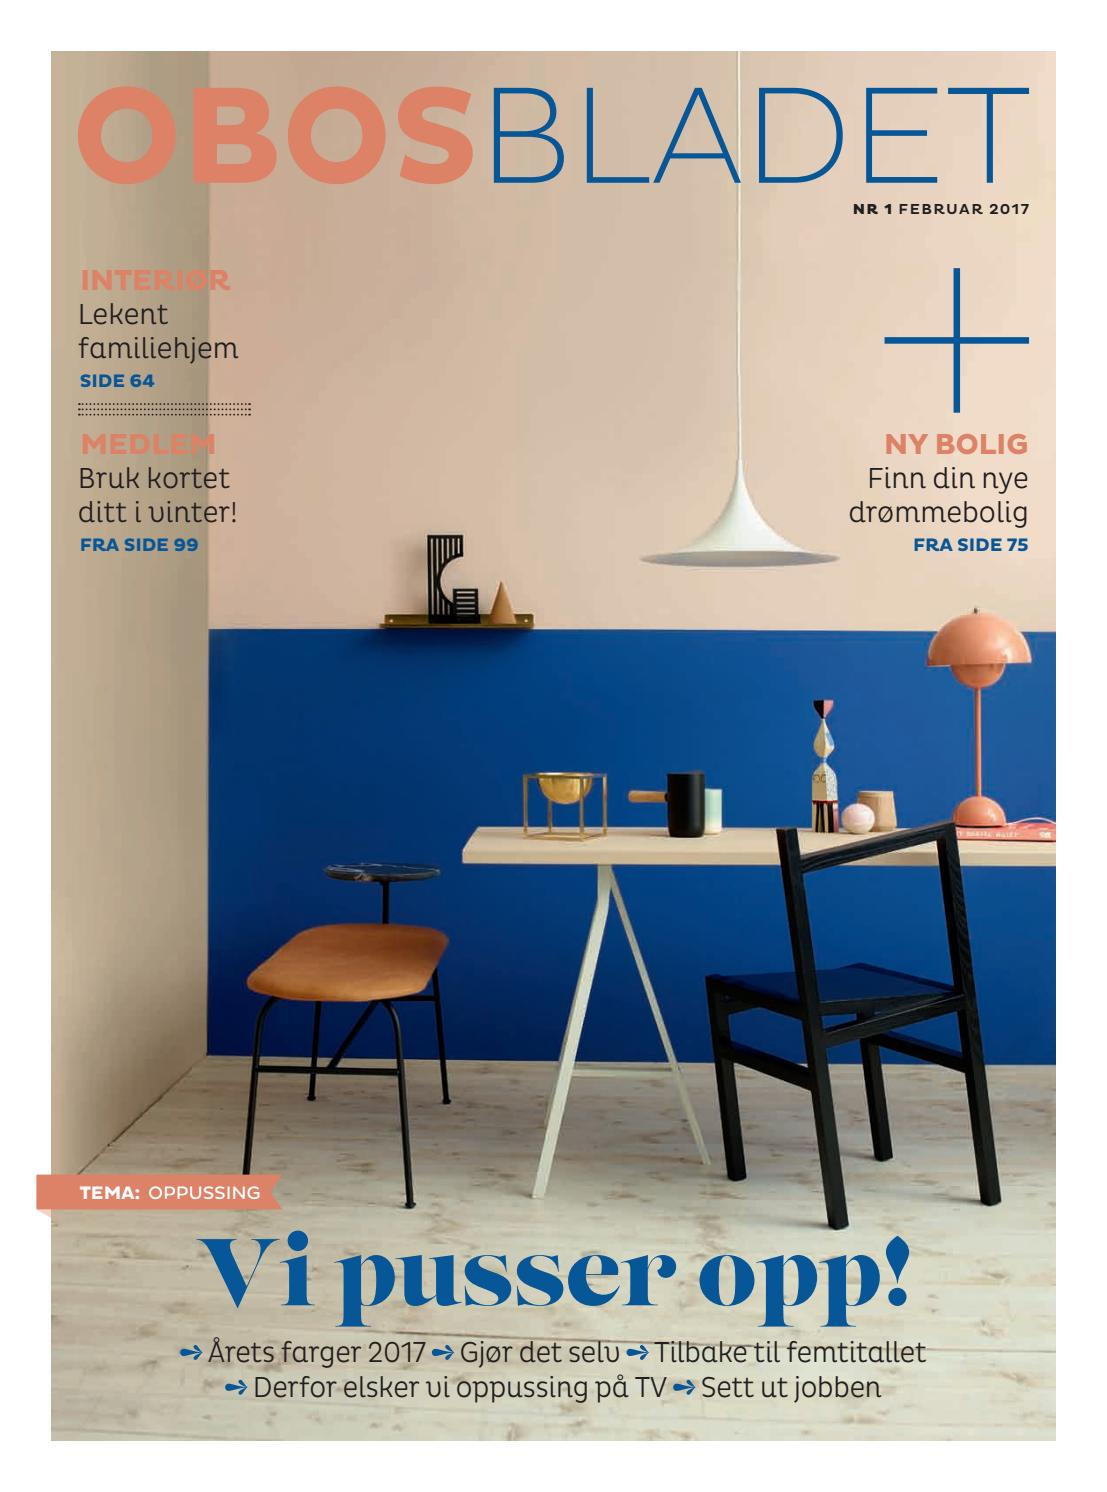 f4db7ee9 OBOS-bladet nr 1 2017 by OBOS BBL - issuu